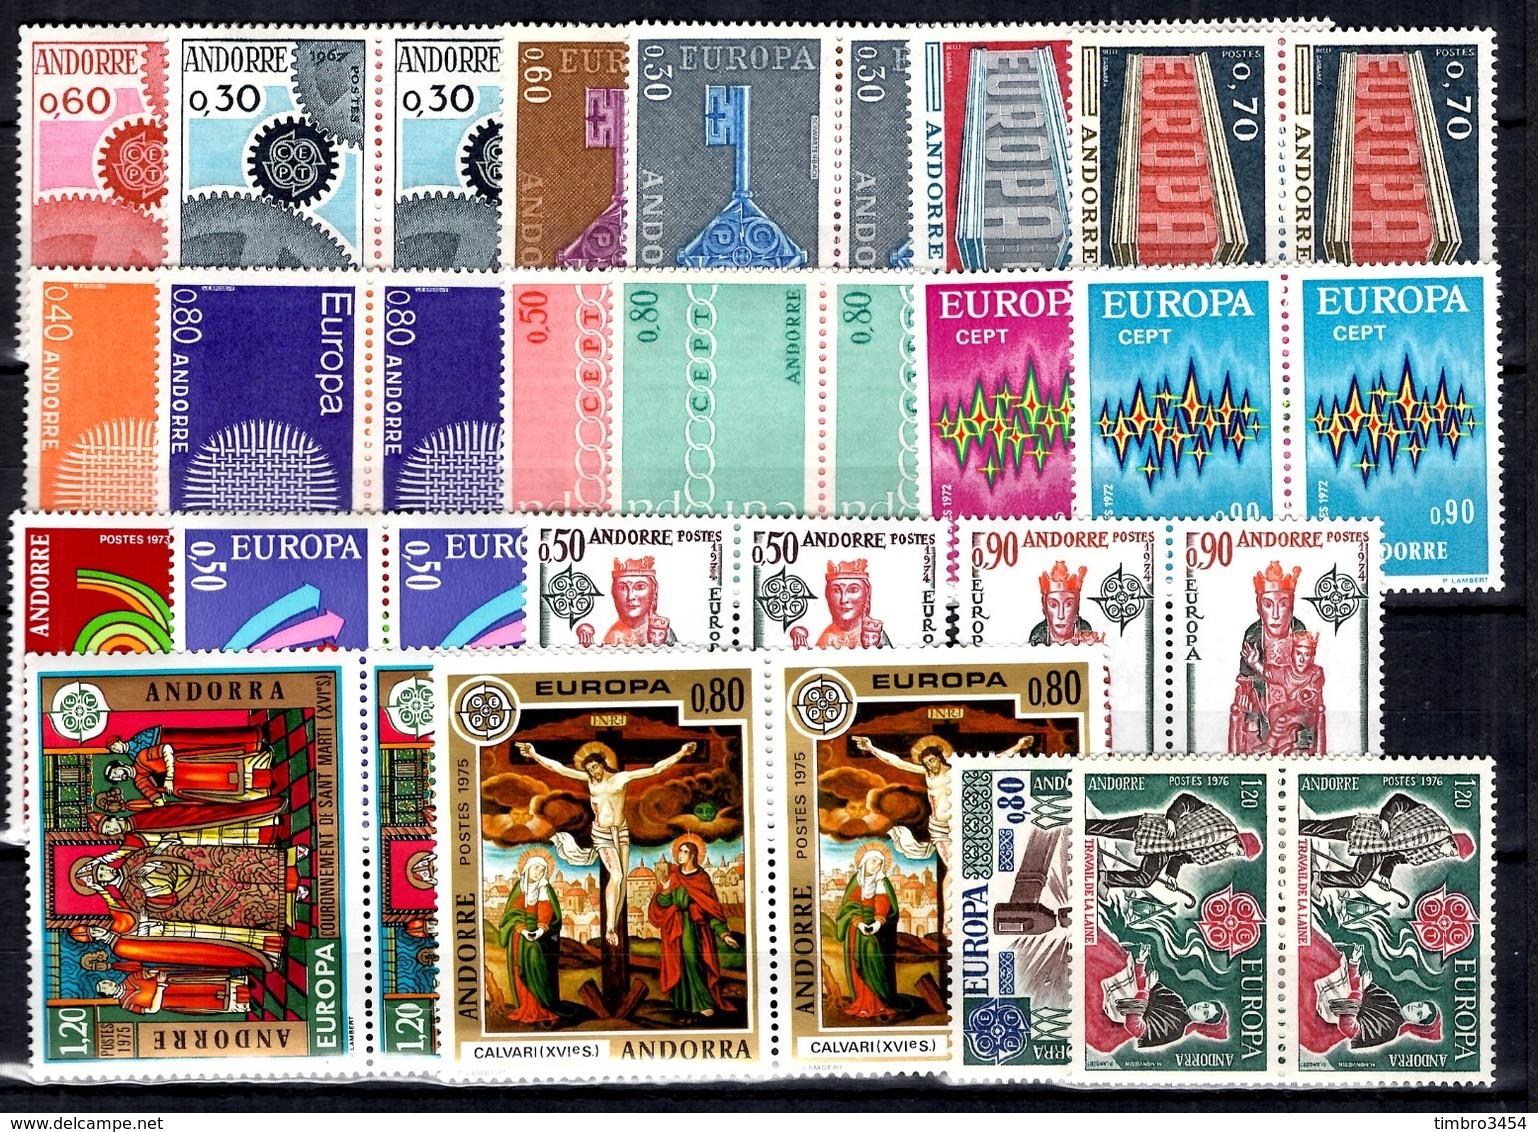 Andorre Séries Europa Complètes 1967/1976 En Paires Neufs ** MNH. TB. A Saisir! - Neufs